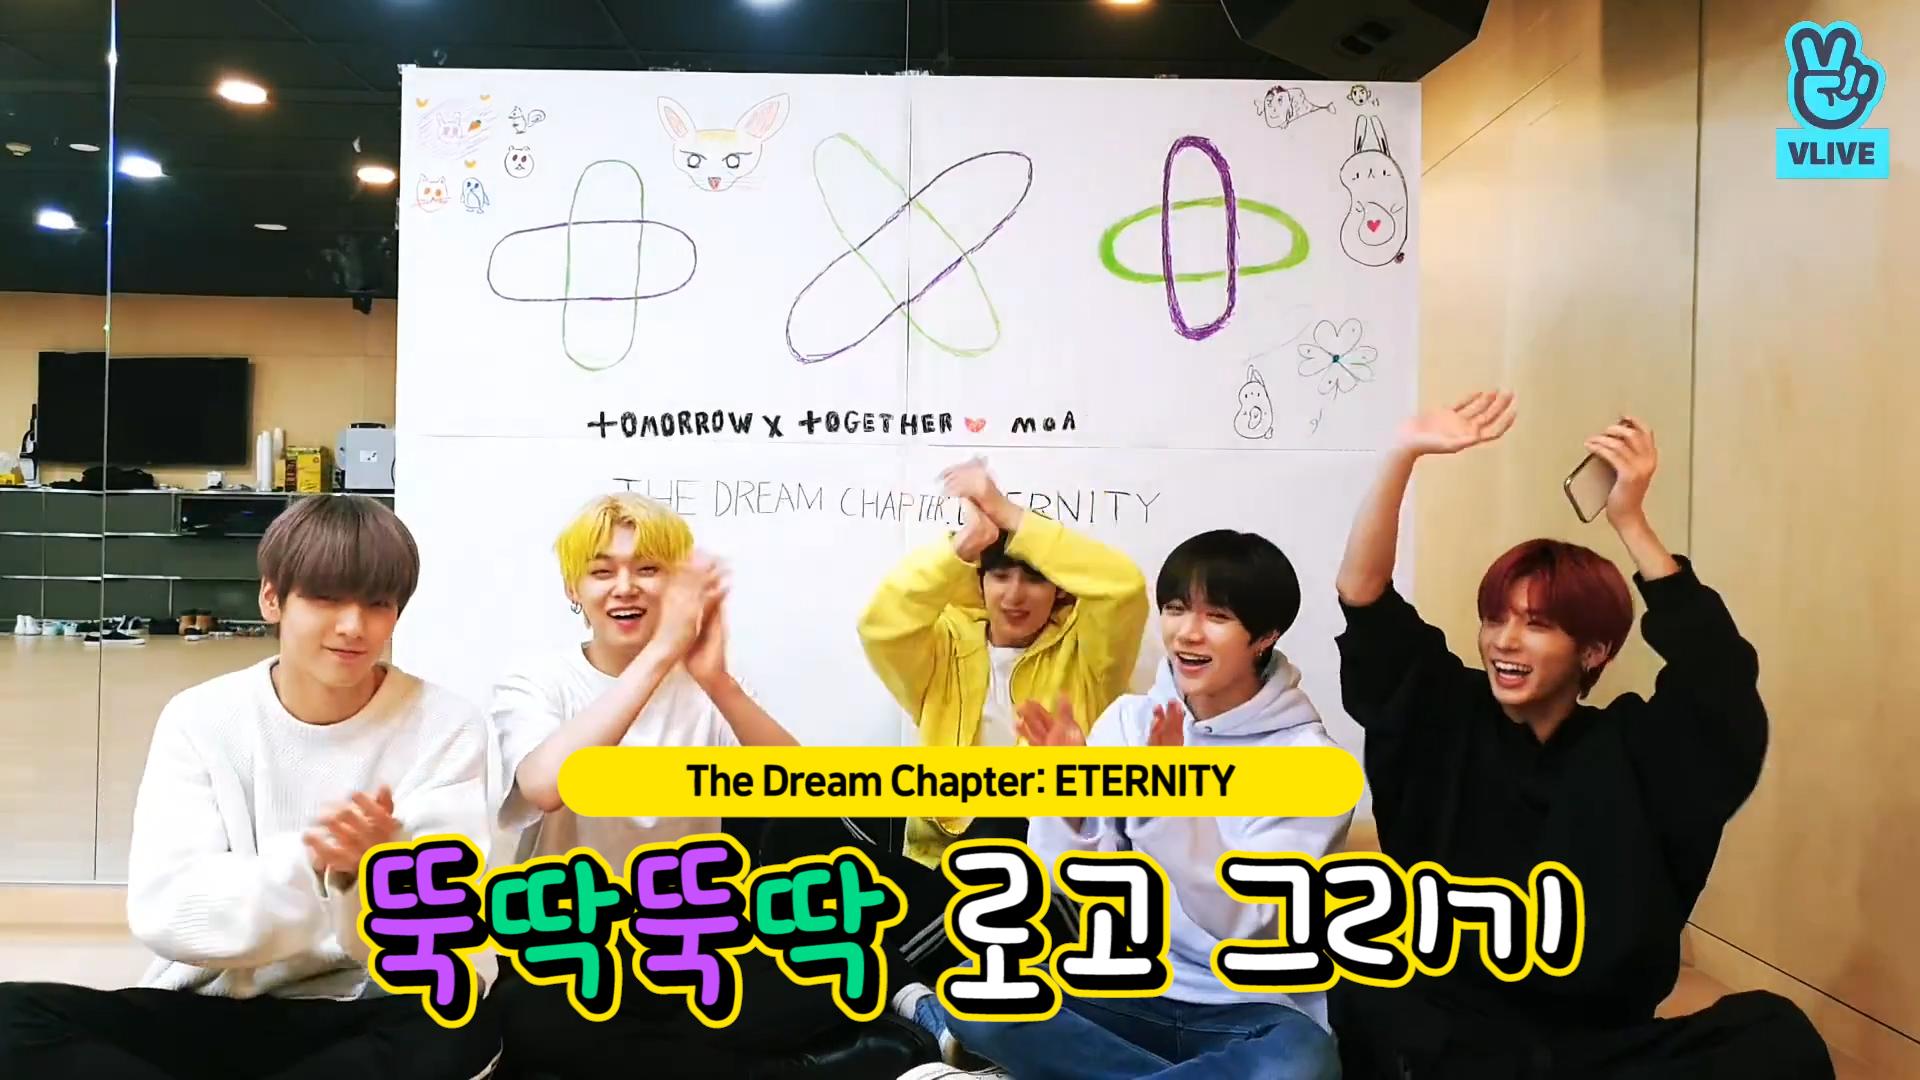 [TXT] 내가 툽 사랑하기 담당할게.. 그림 담당은 누가 할래?🎨 (TXT drawing their new logo)